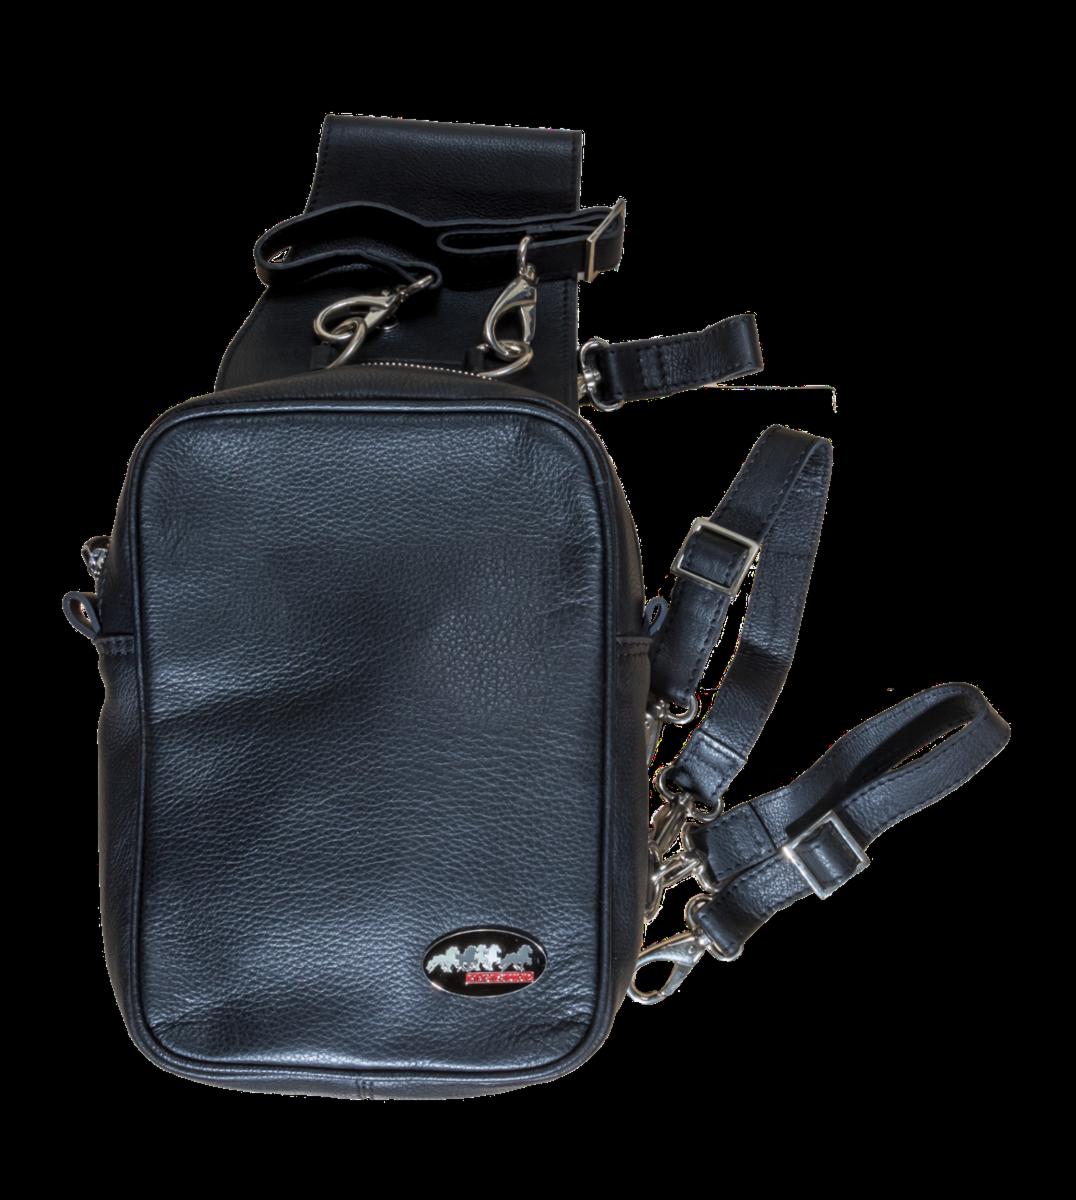 KARLSLUND_leather_saddle_bag_k406L-2